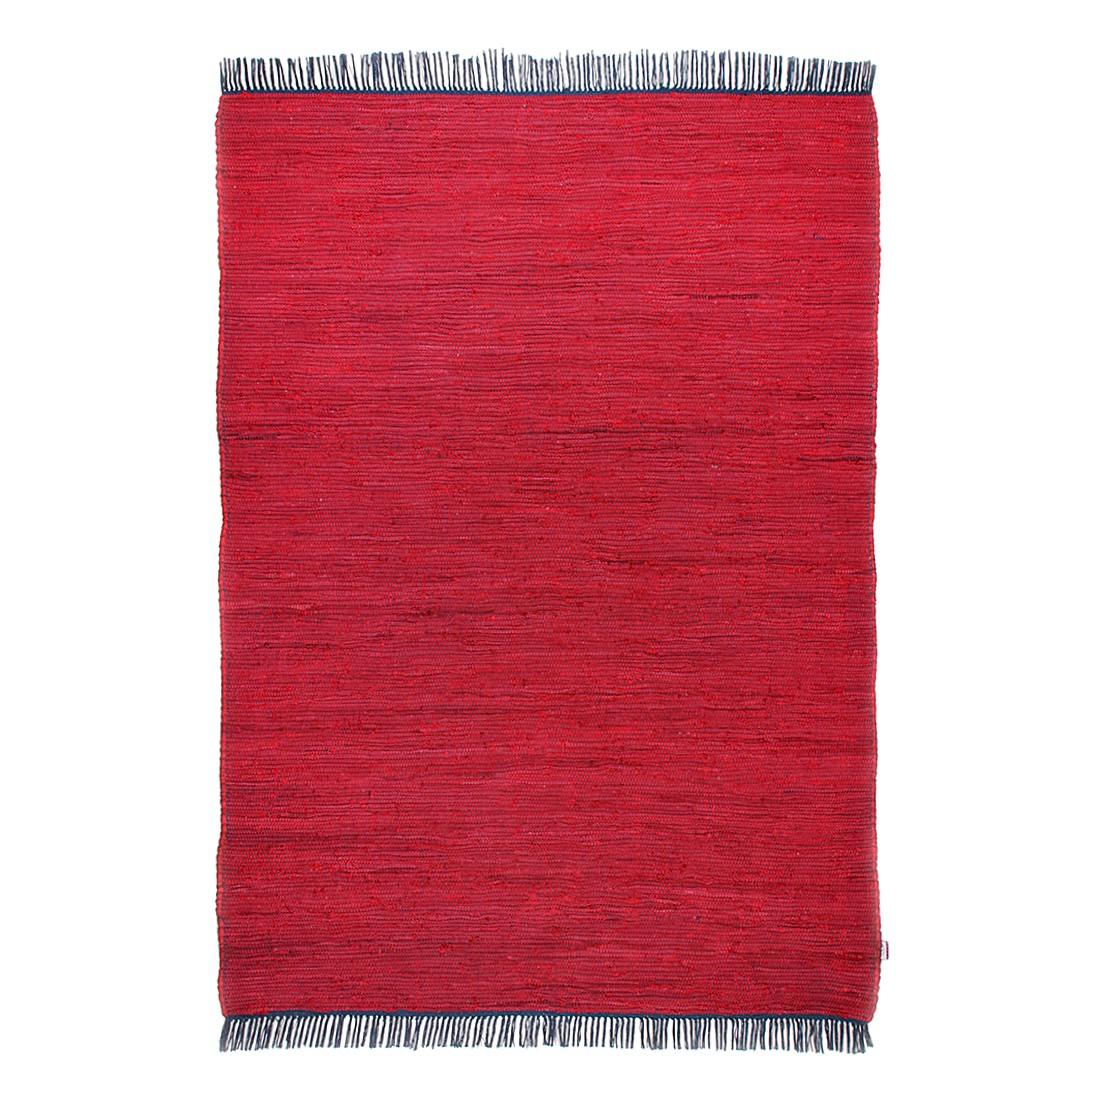 Vloerkleed Cotton - Rood - 160x230cm, Tom Tailor